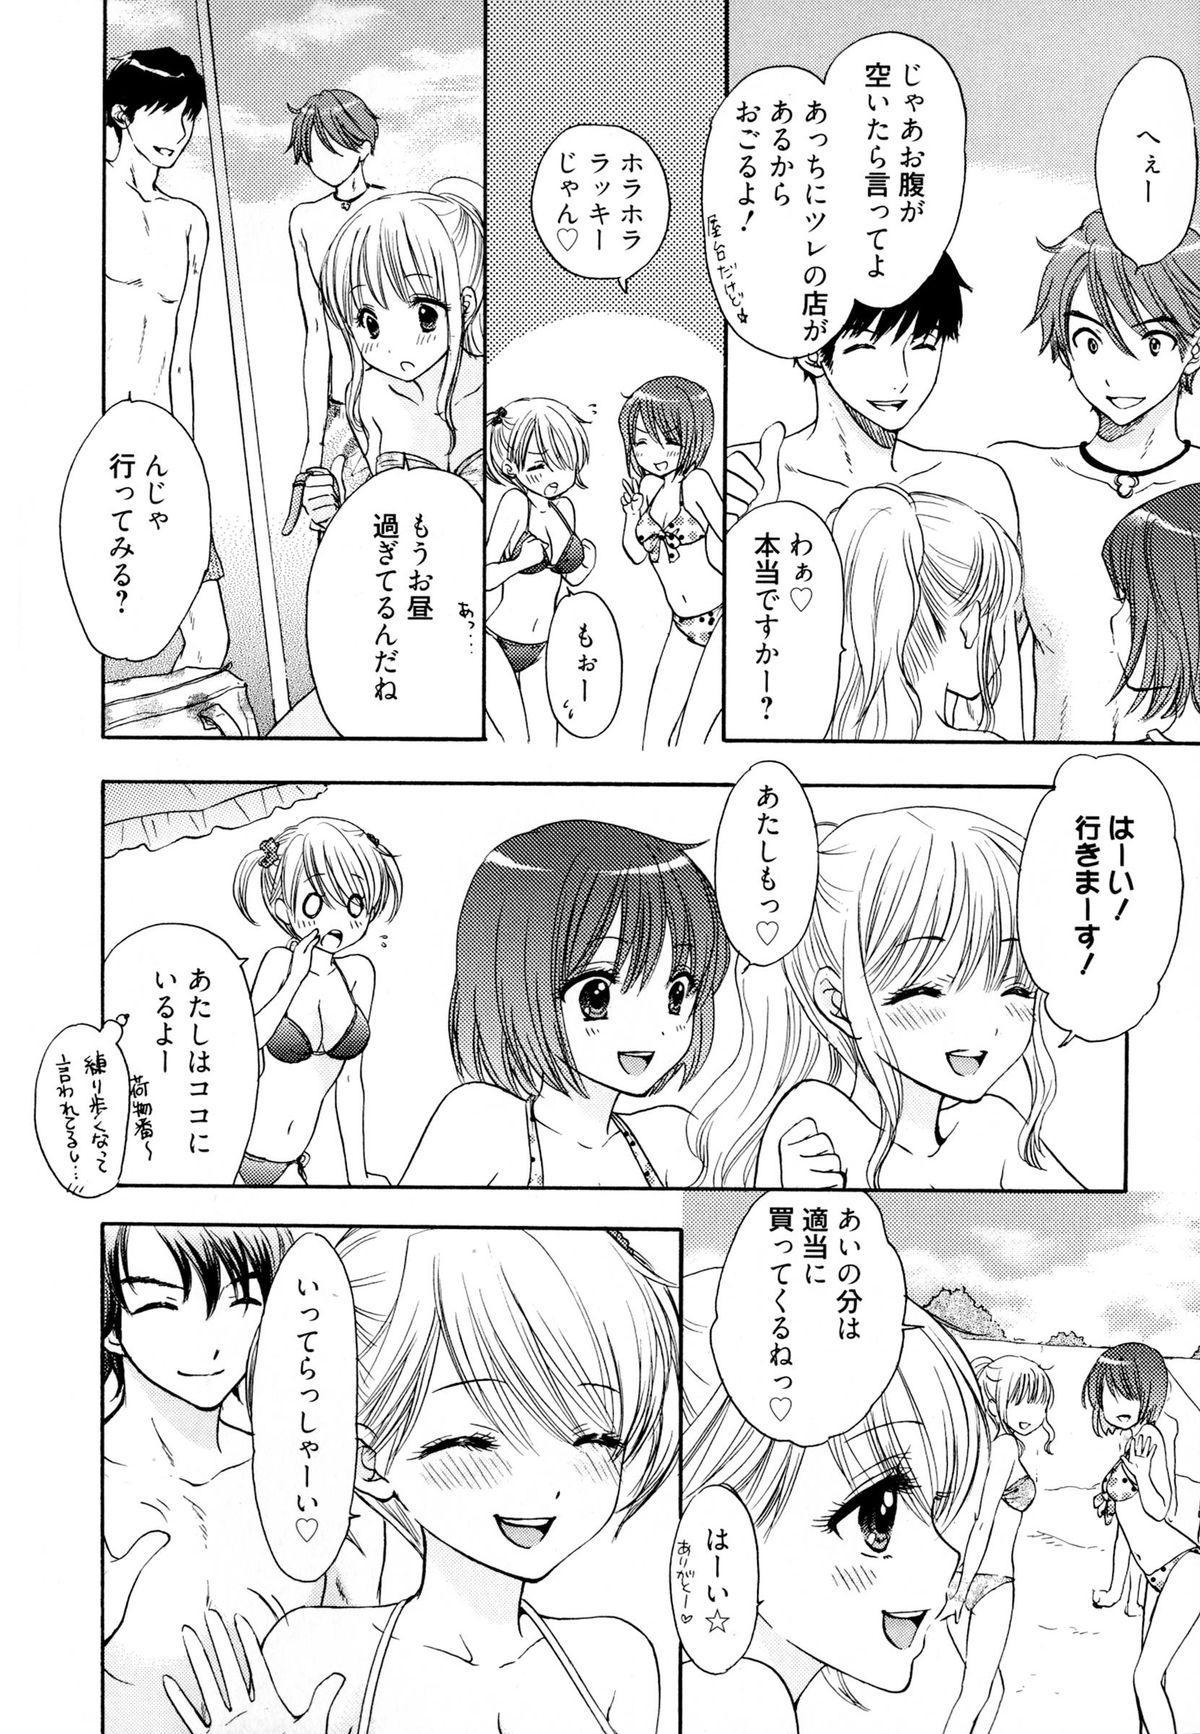 The Great Escape 4 Shokai Genteiban 139